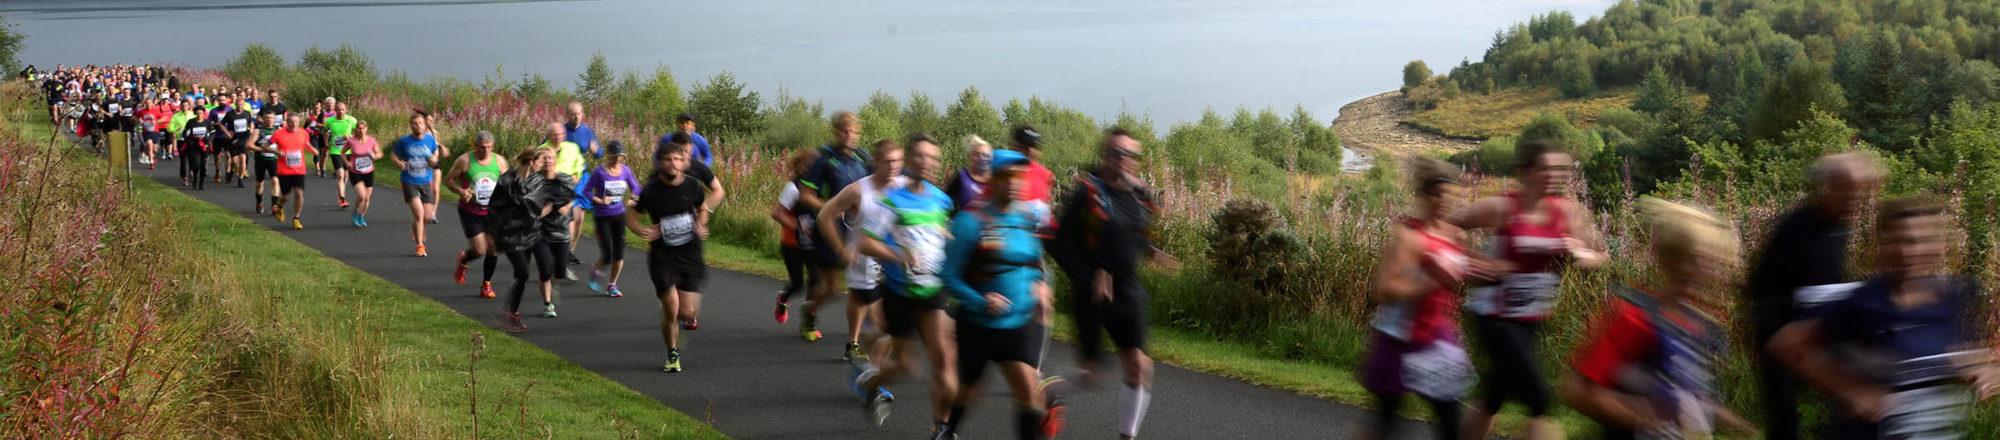 Kielder Half Marathon in Northumberland | Kielder Waterside